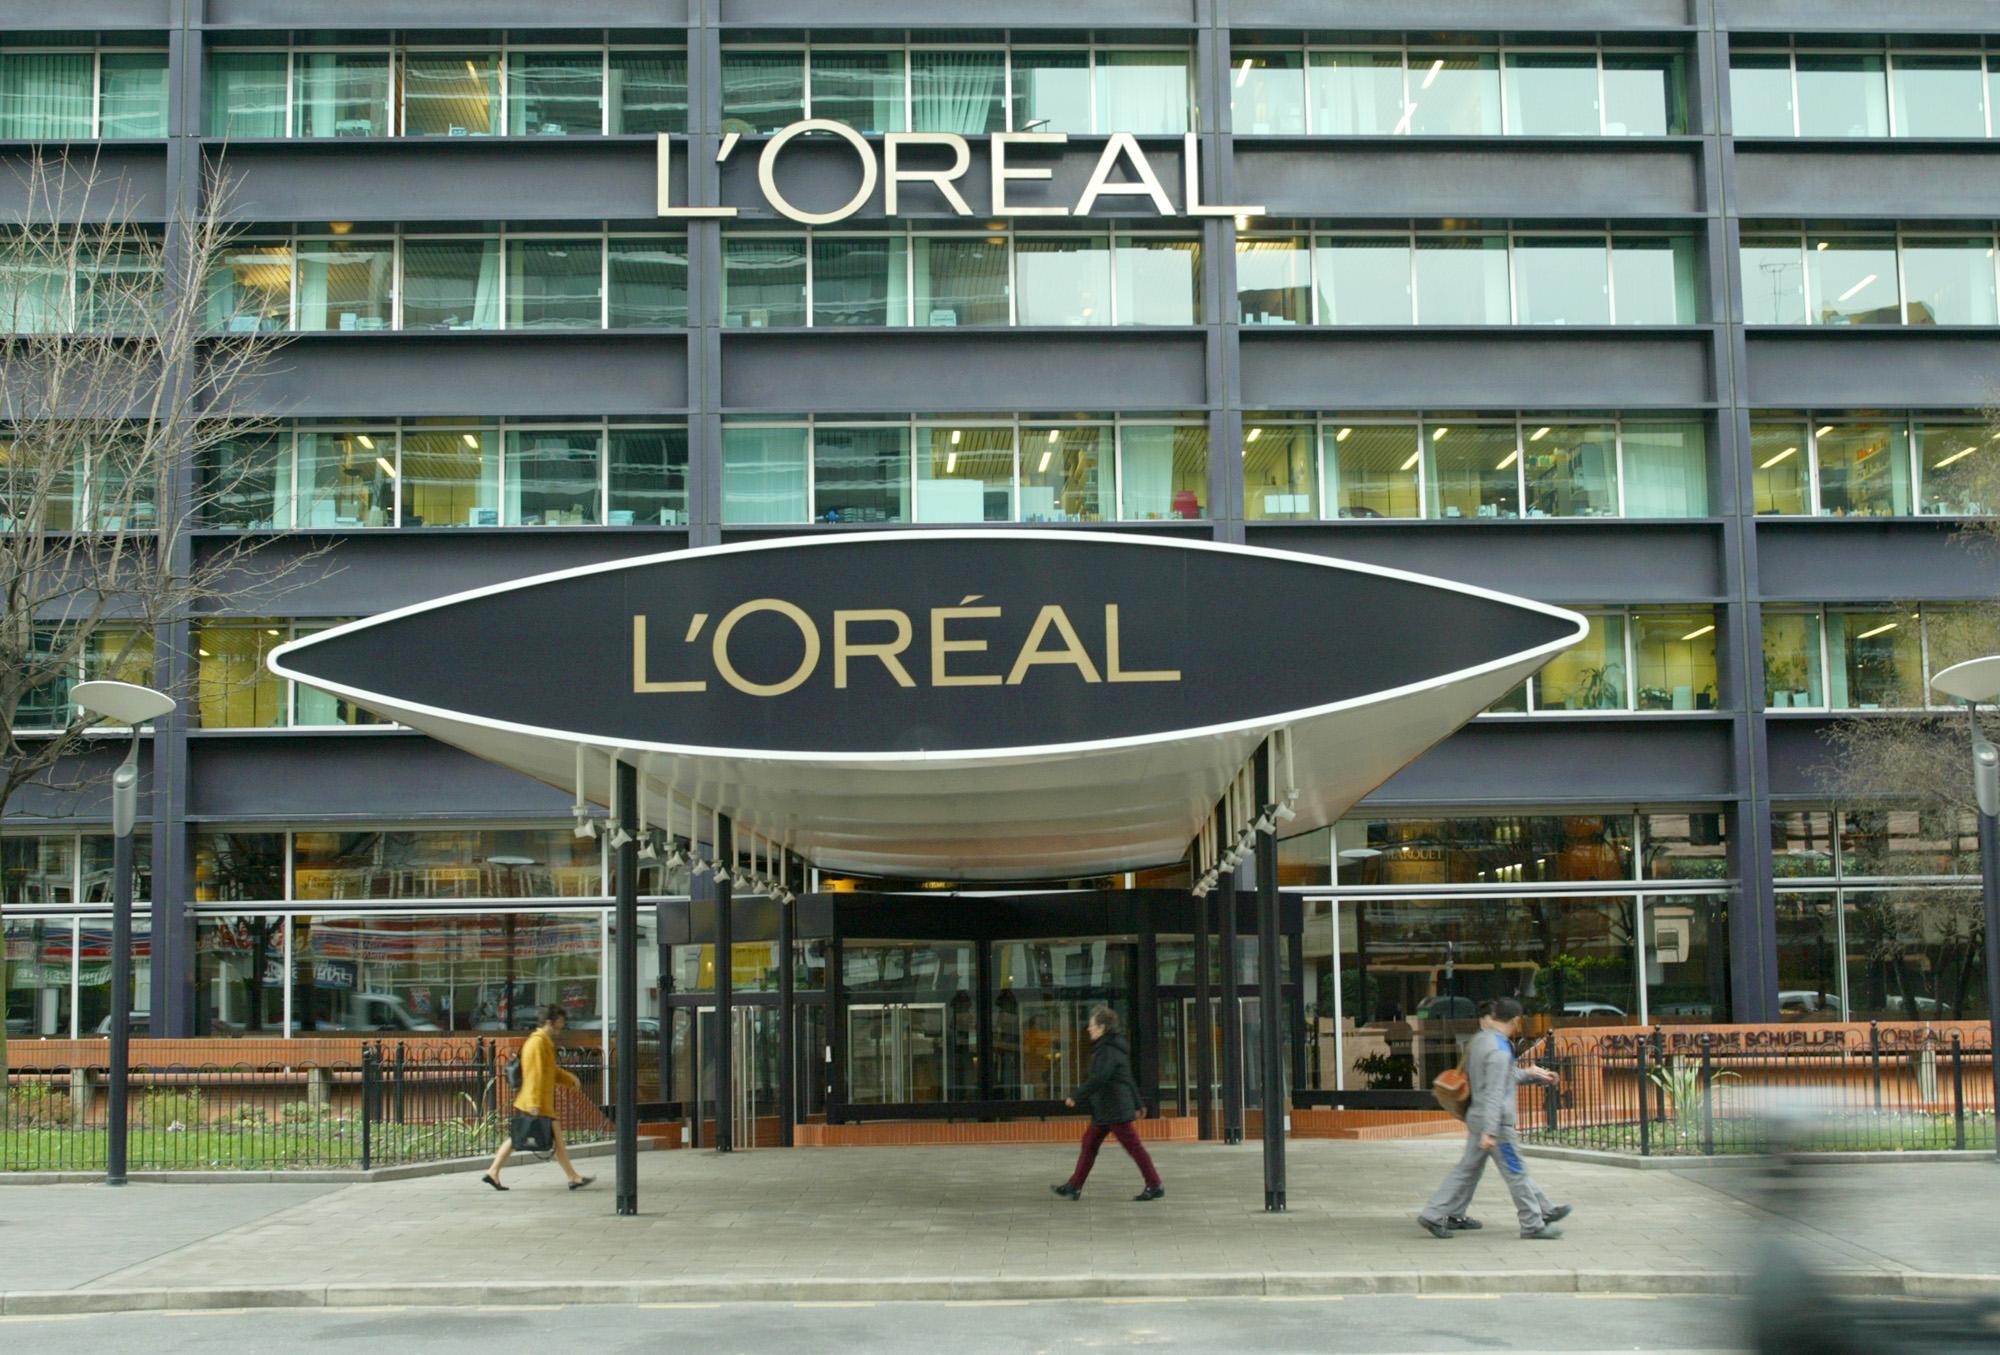 L'Oréal - L'Oréal pretende comprar una participación de Nestlé